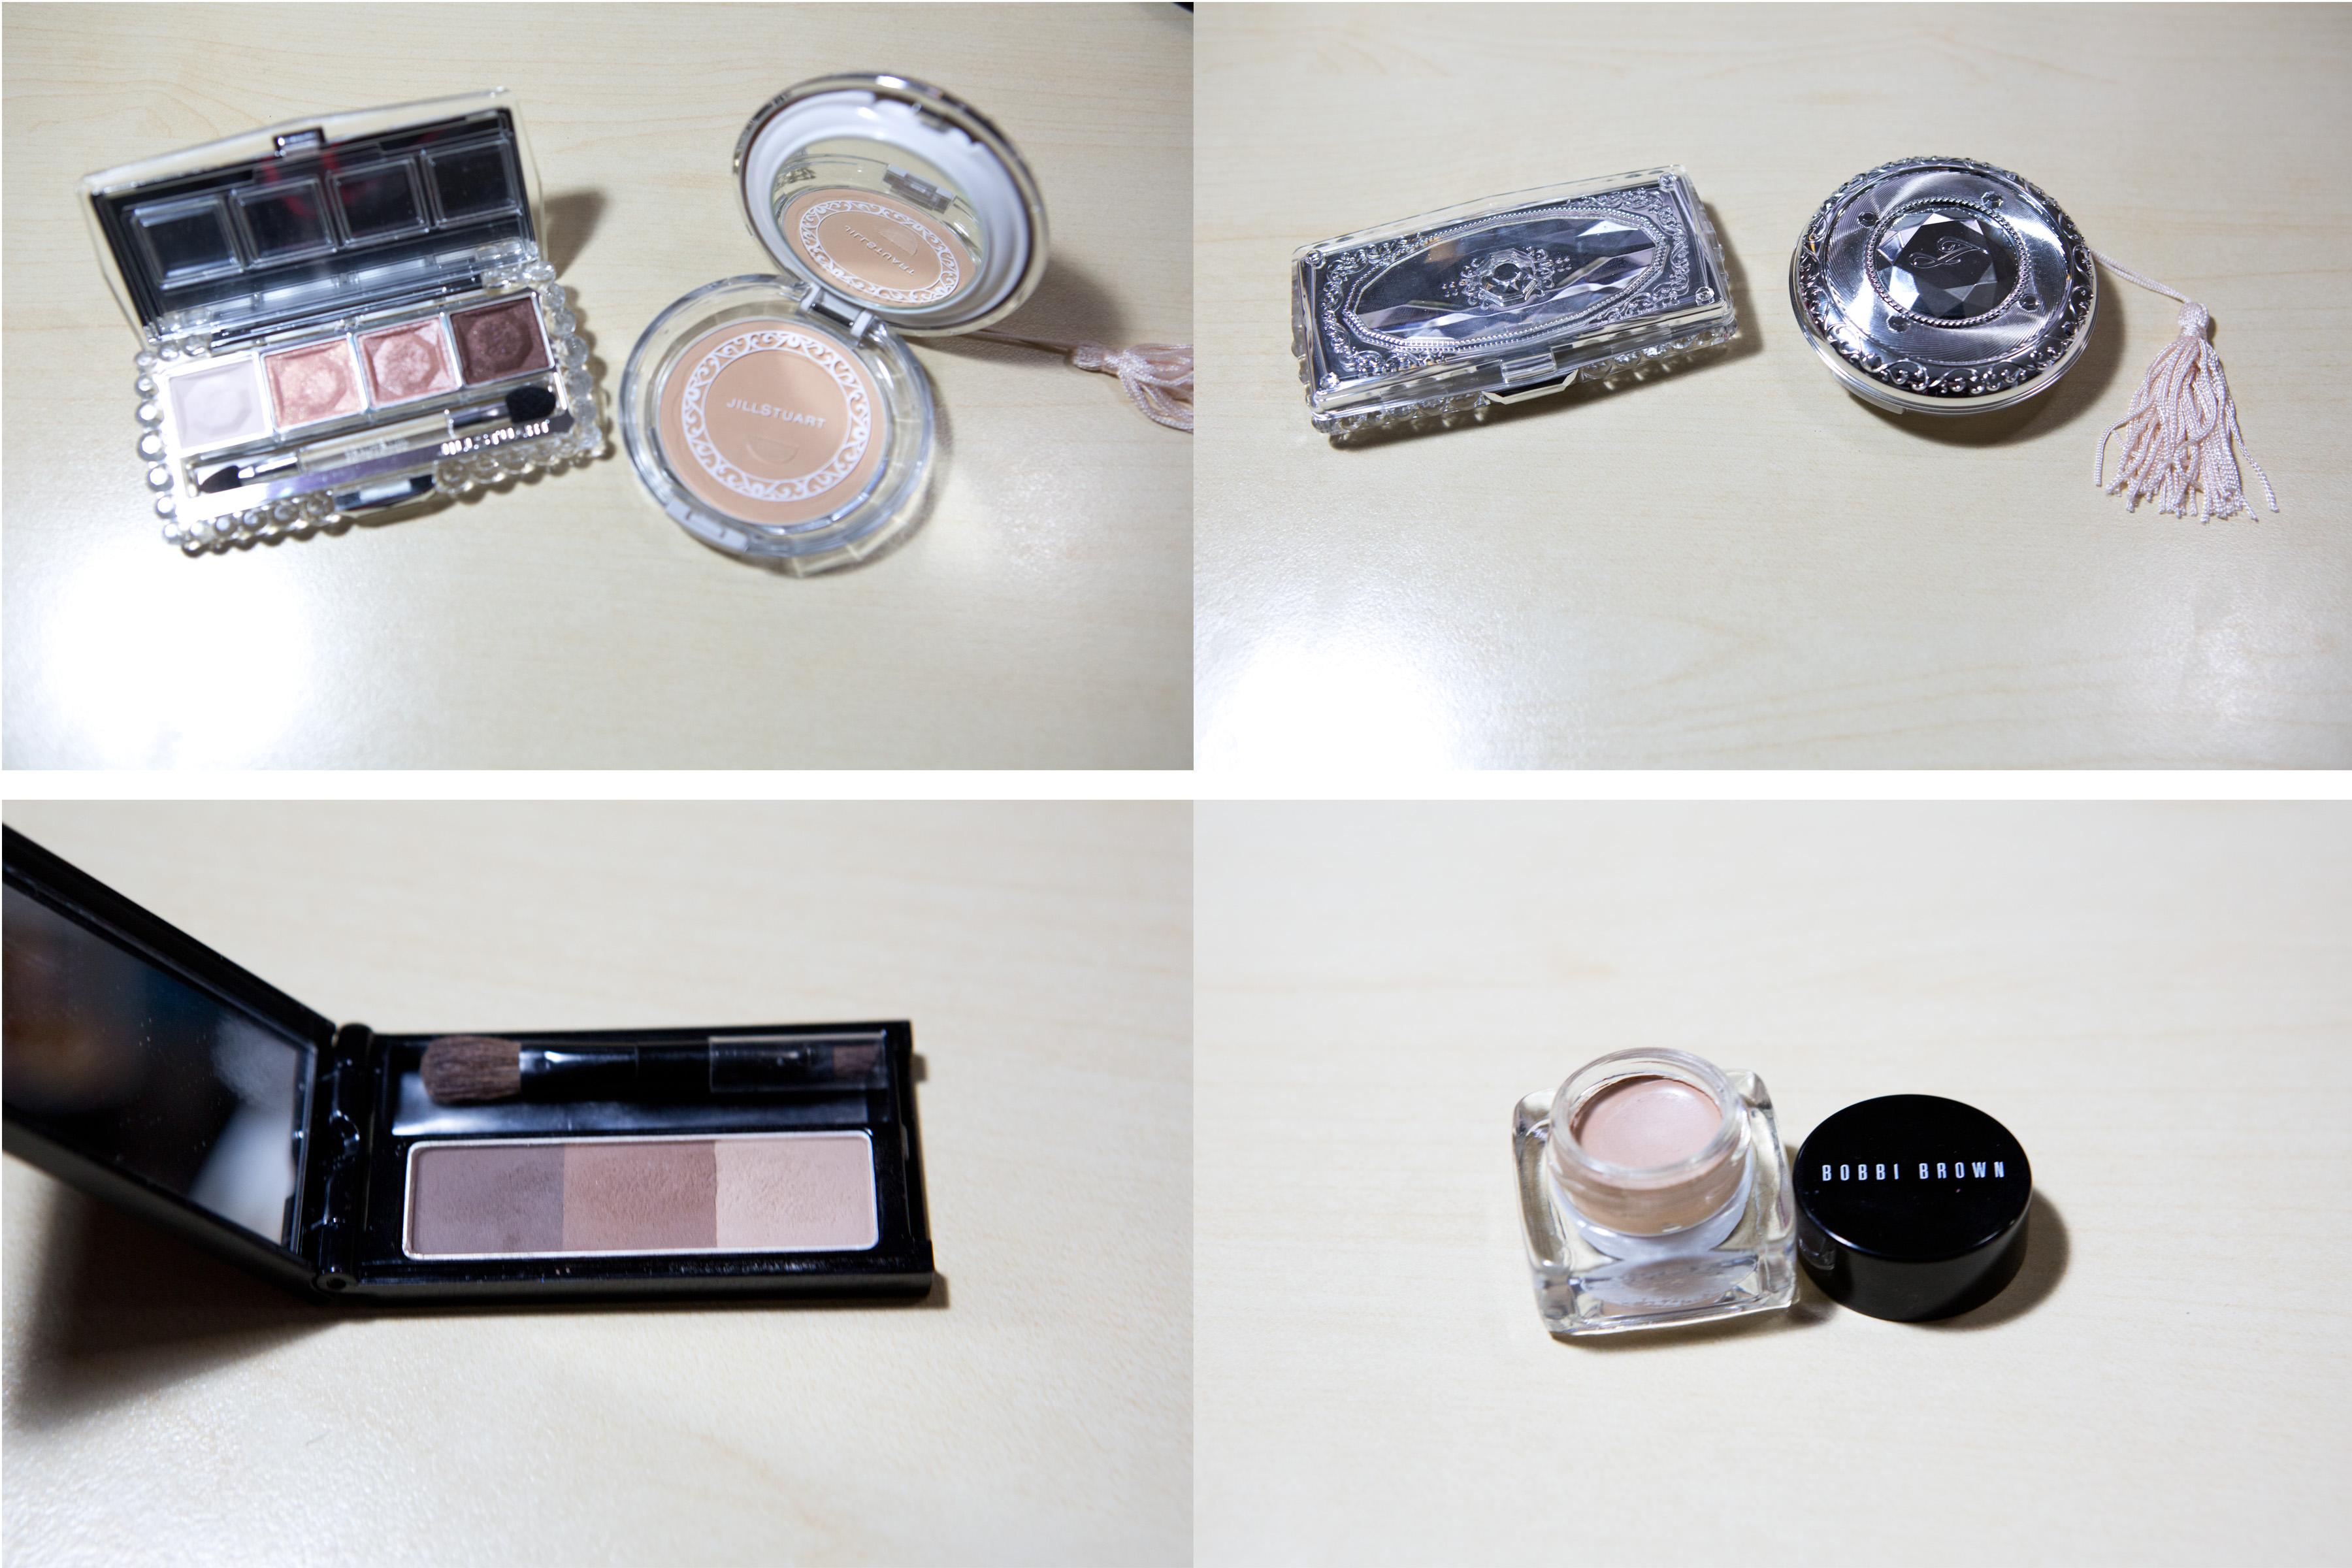 Jill Stuart The Photojaneic 3 Beauty Gel Liner Black Pic 1 Eyeshadow In 01 Nudy Venus I Love It Sooo Much And Pressed Powder 103 Nude